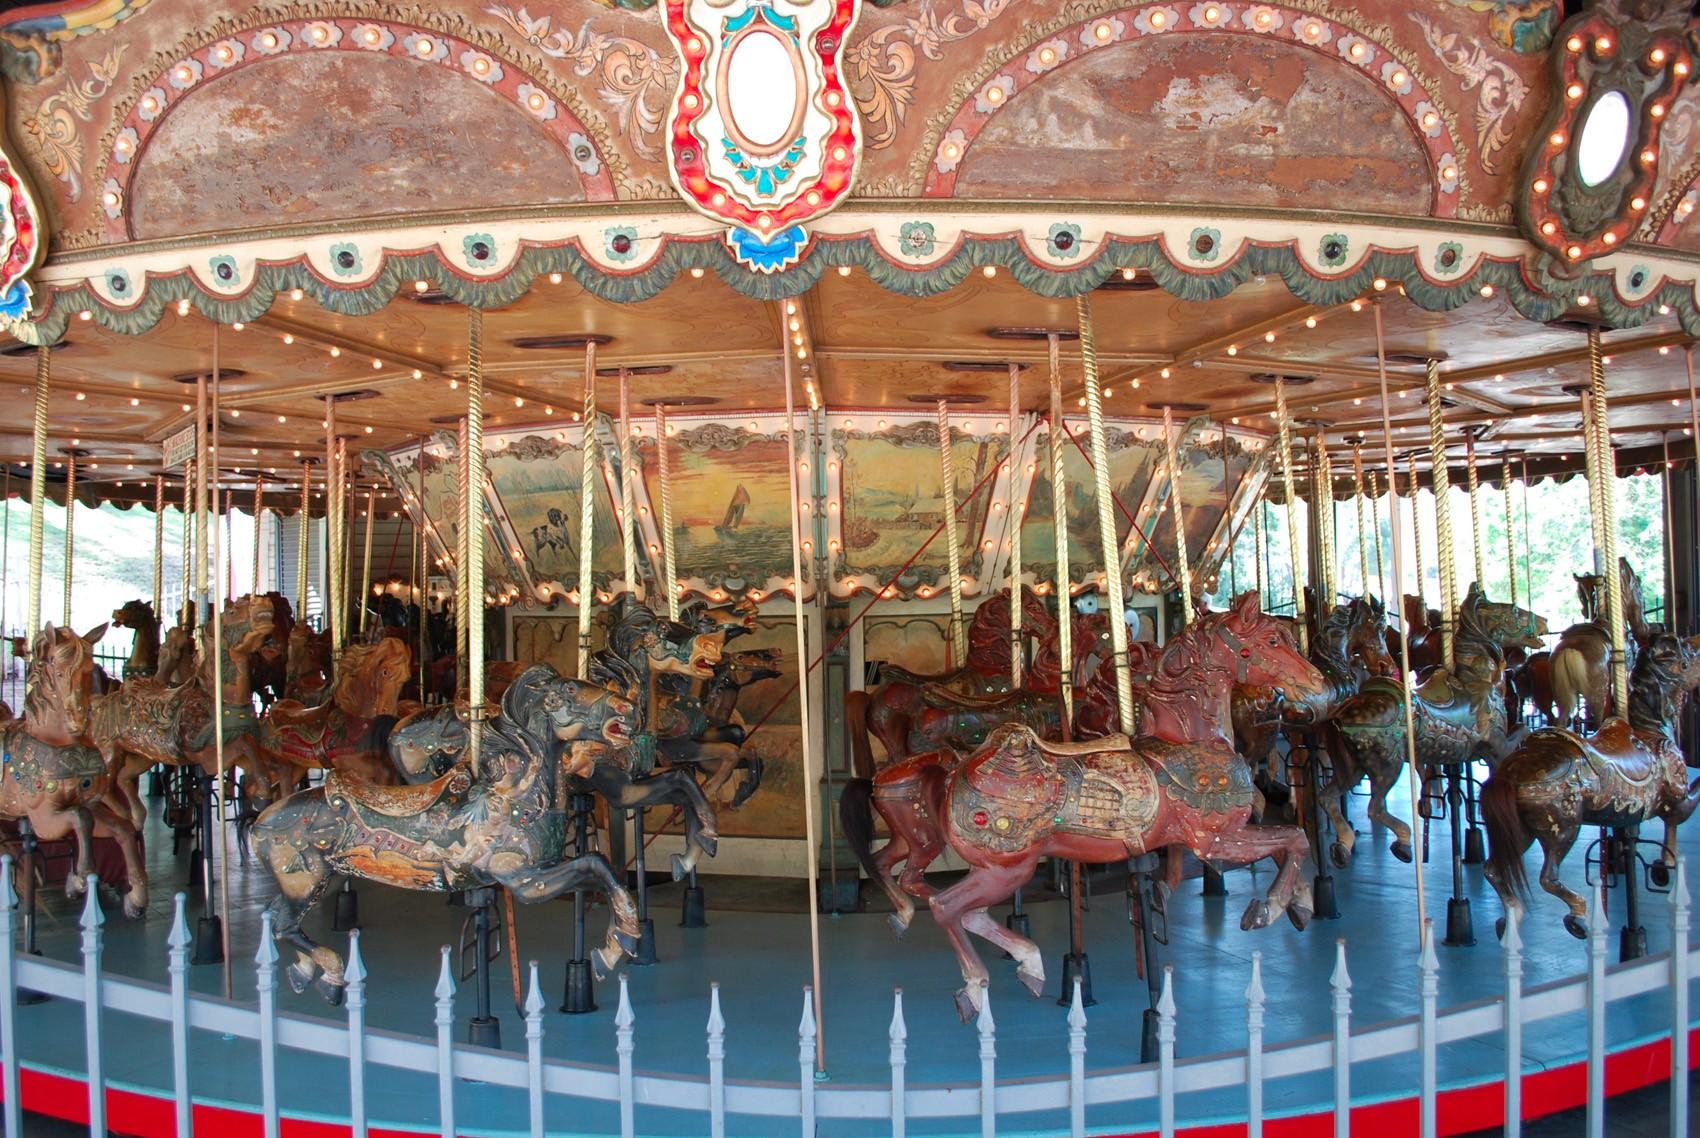 Historic-1926-Griffith-Park-Los-Angeles-carousel-3